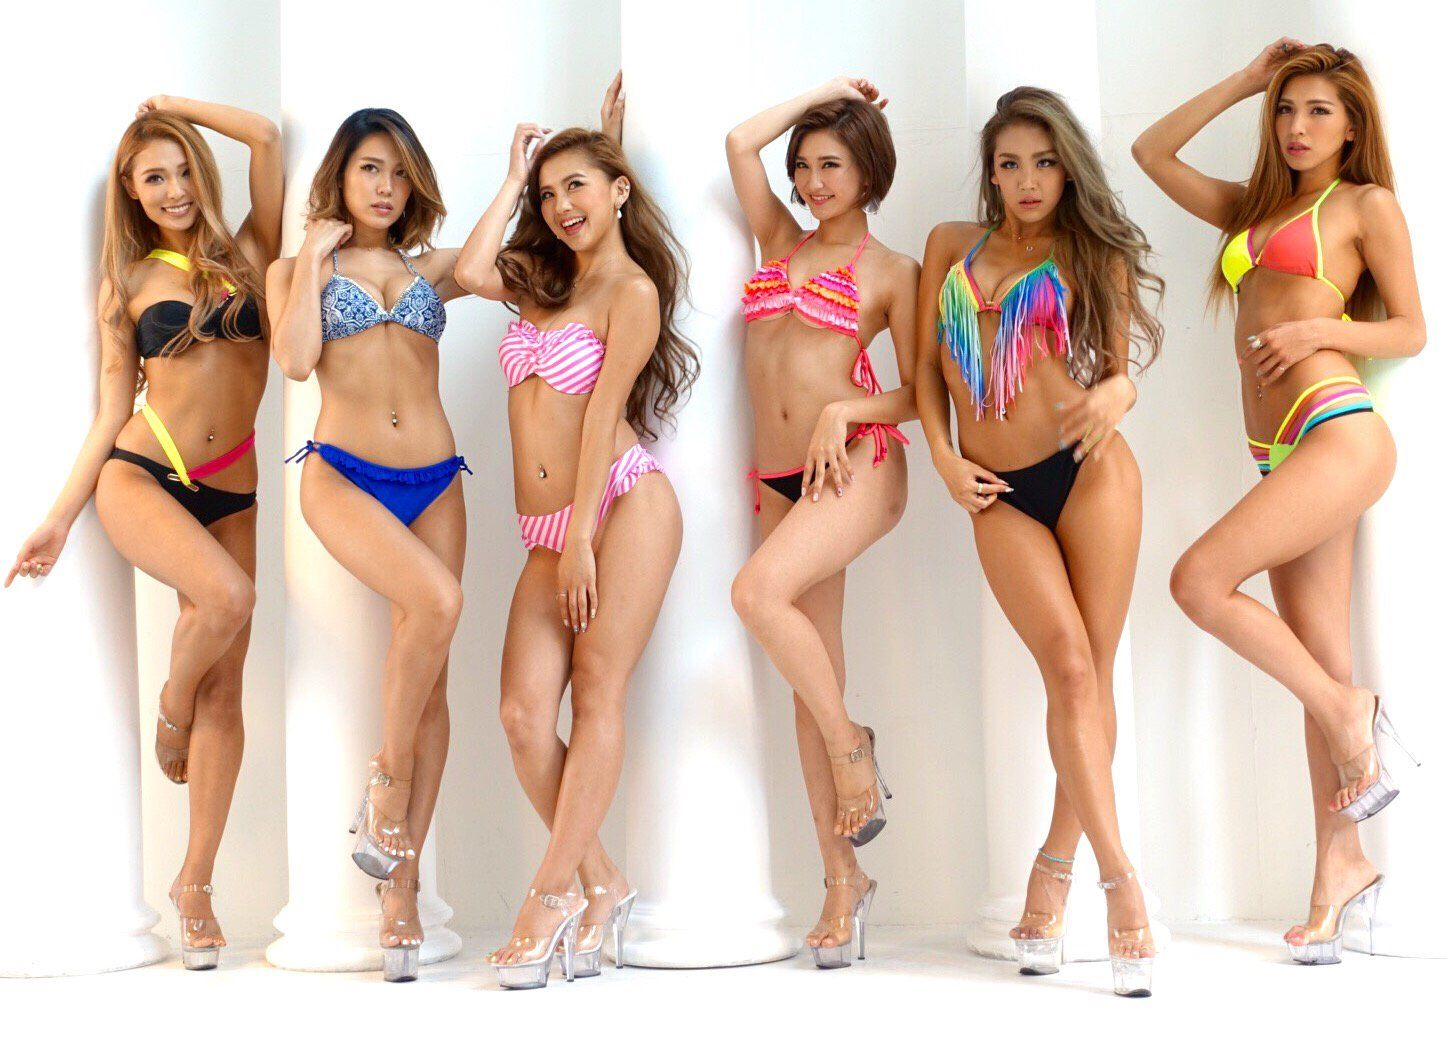 Babes bikini russian dancers brides